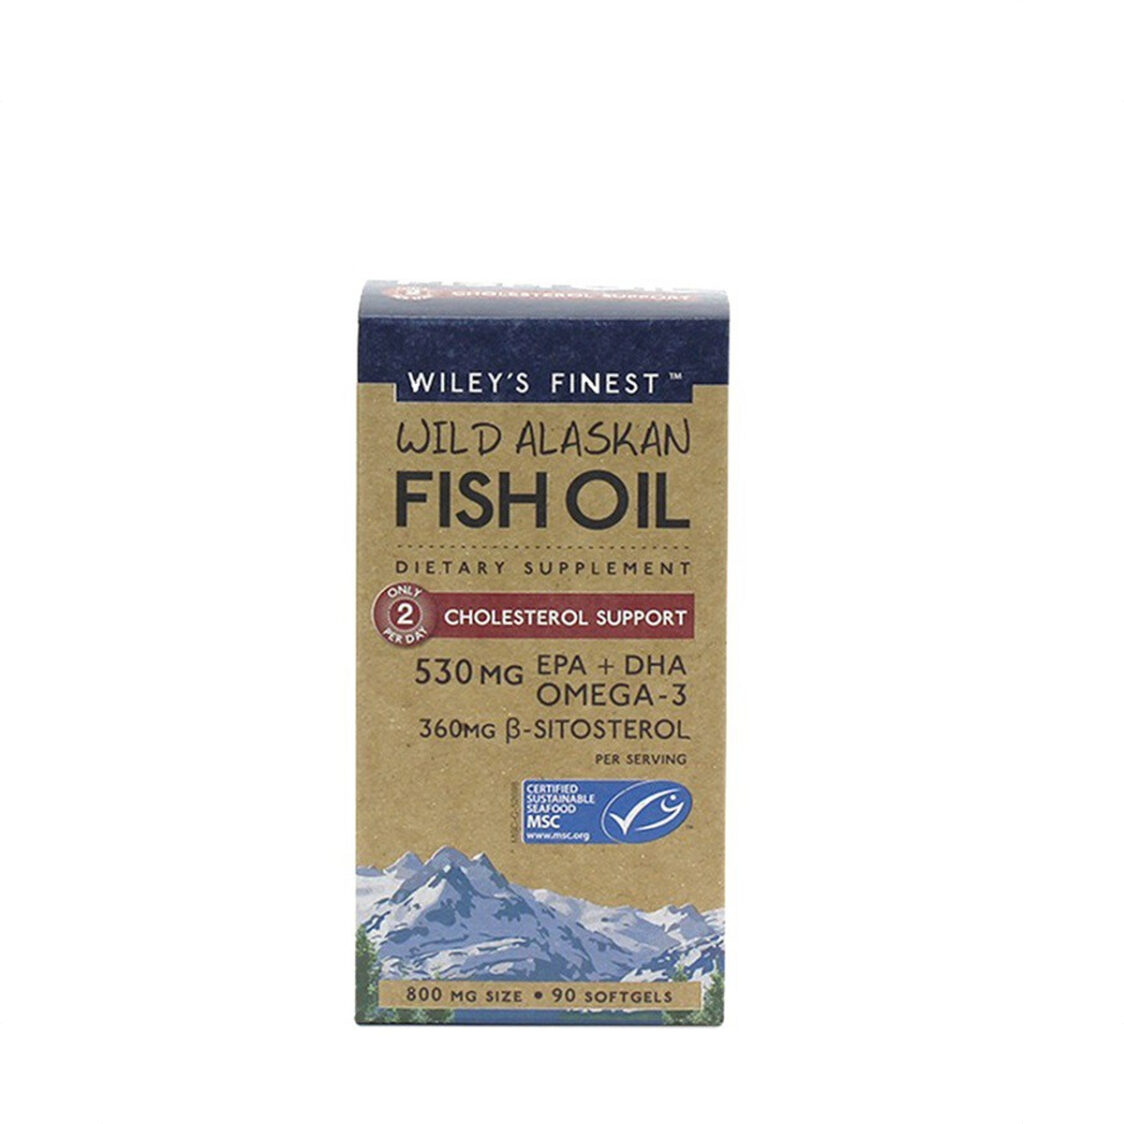 WileyS Finest Wild Alaskan Fish Oil Cholesterol Support 90 soft gels